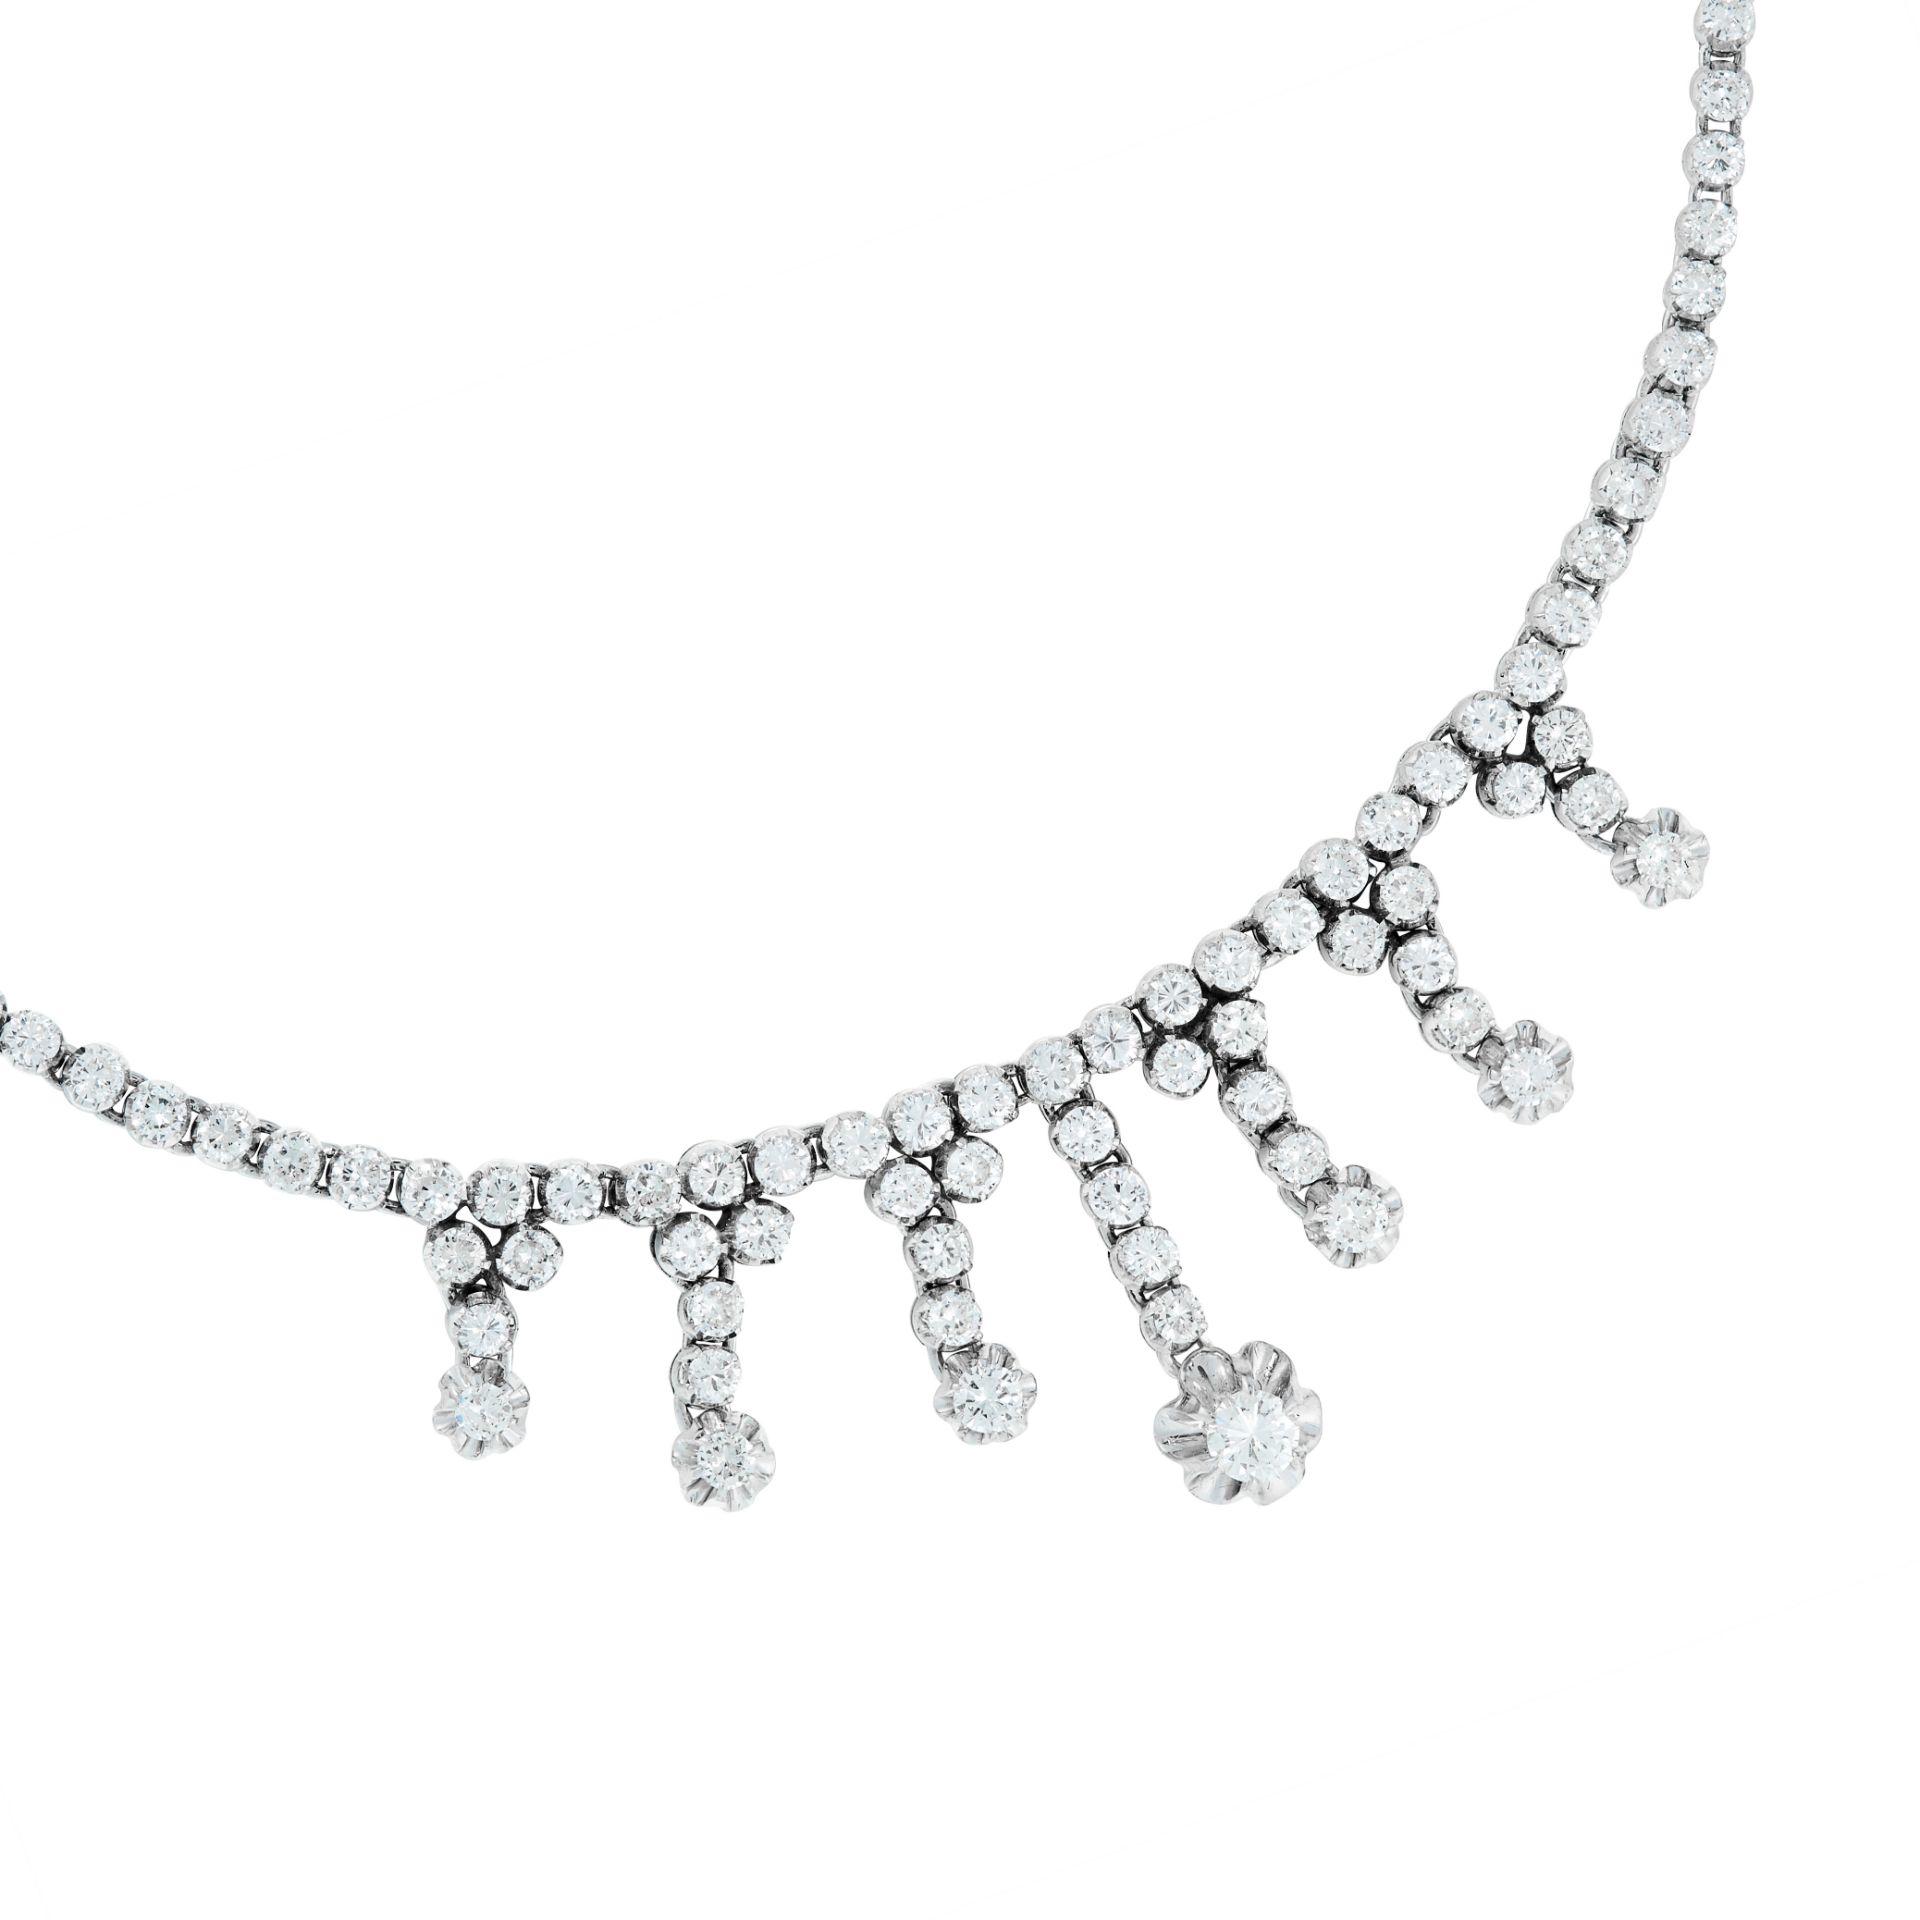 A DIAMOND FRINGE NECKLACE comprising a single row of graduated round cut diamonds, suspending